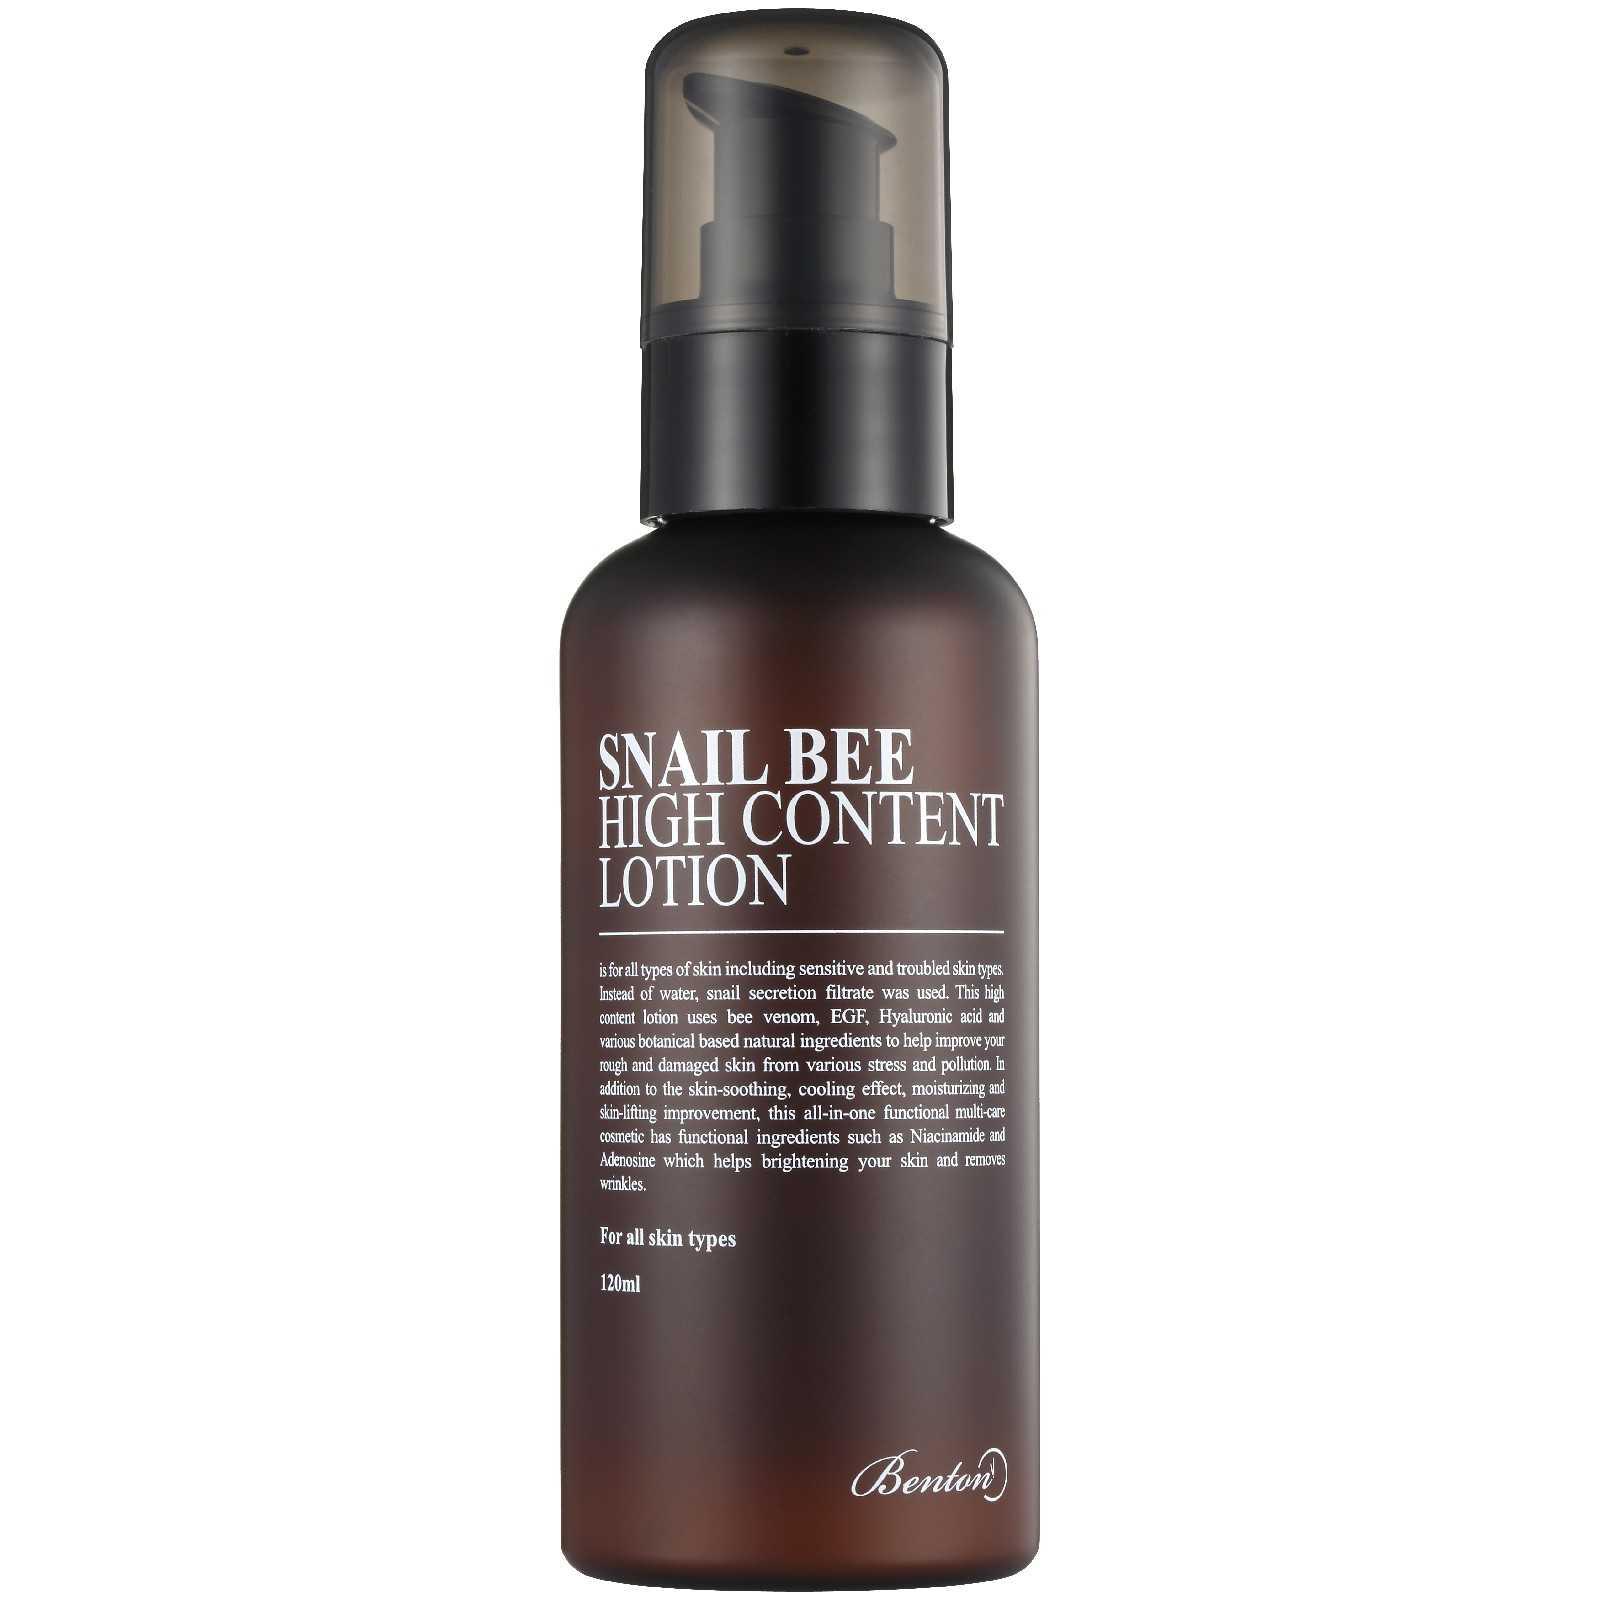 Benton Snail Bee High Content Lotion crema viso fluida alla bava di lumaca The K Beauty